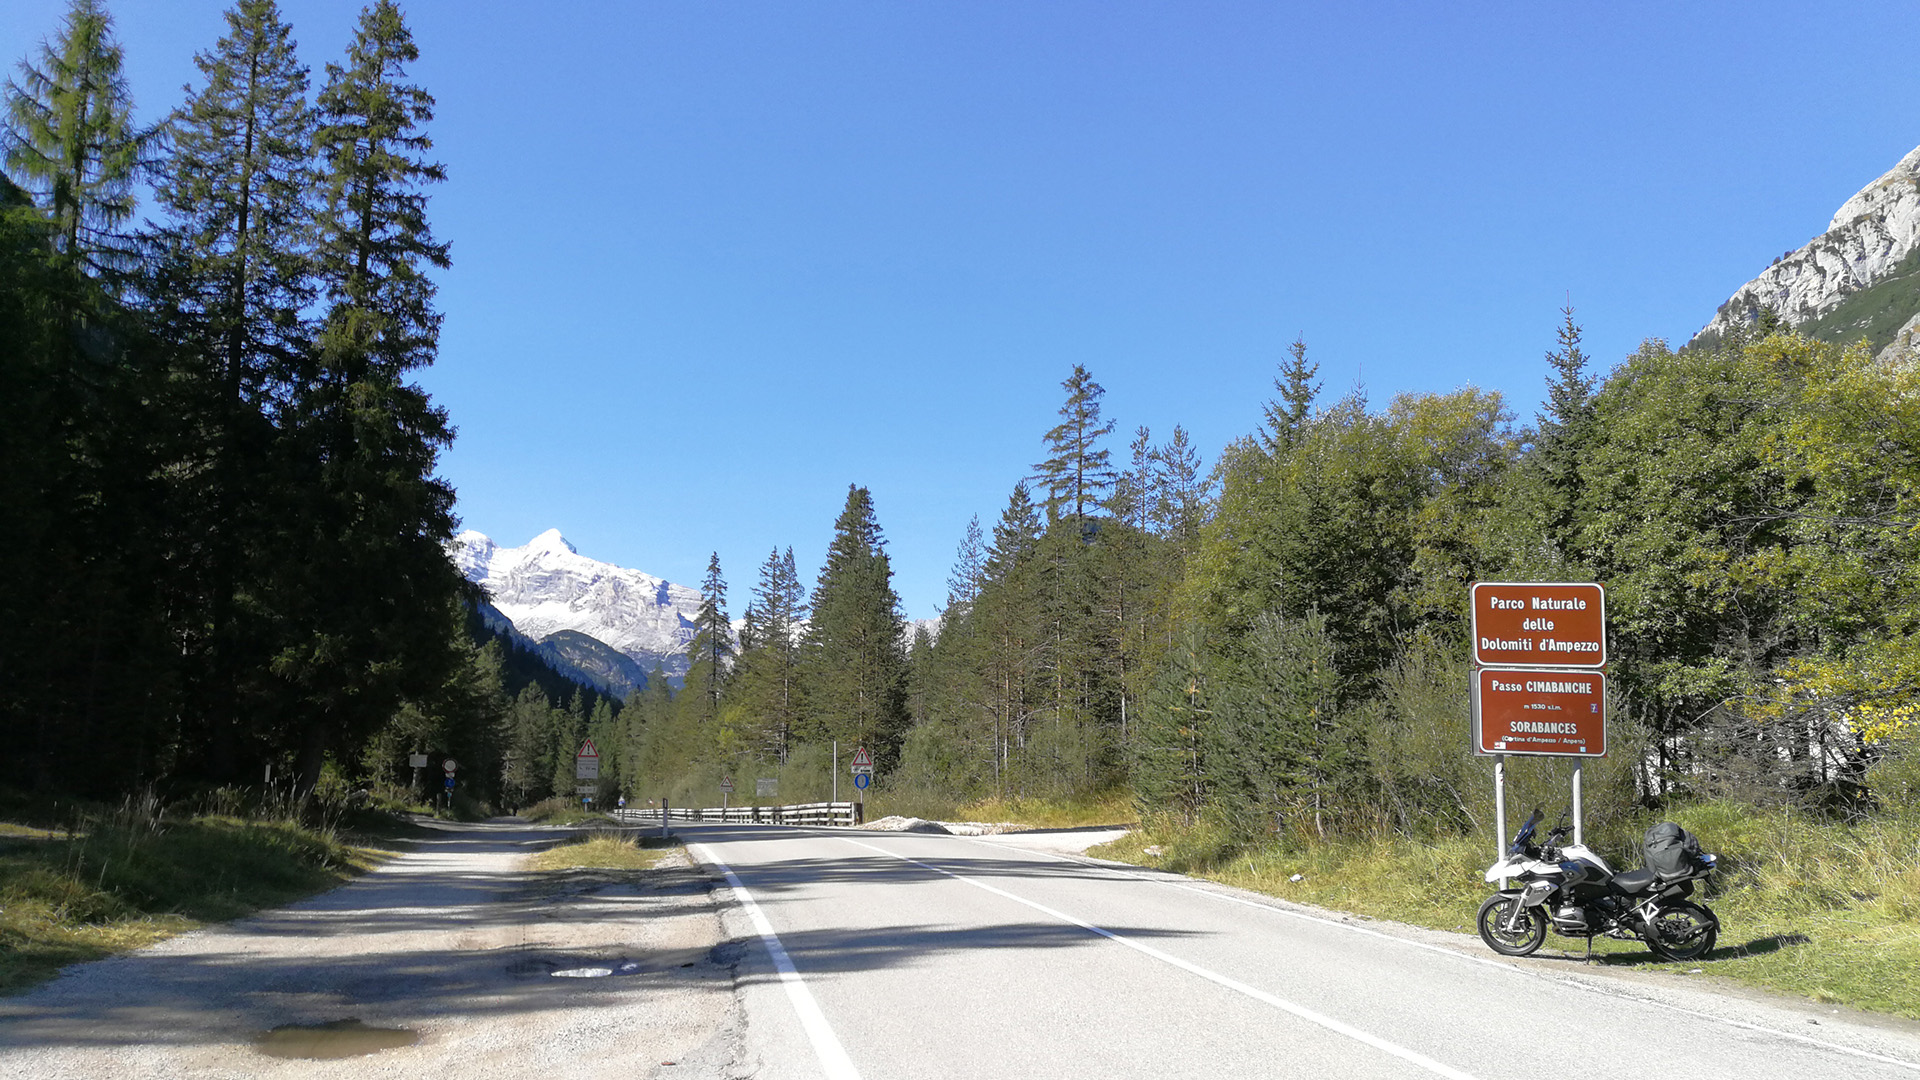 1530 - I - Passo Cimabanche